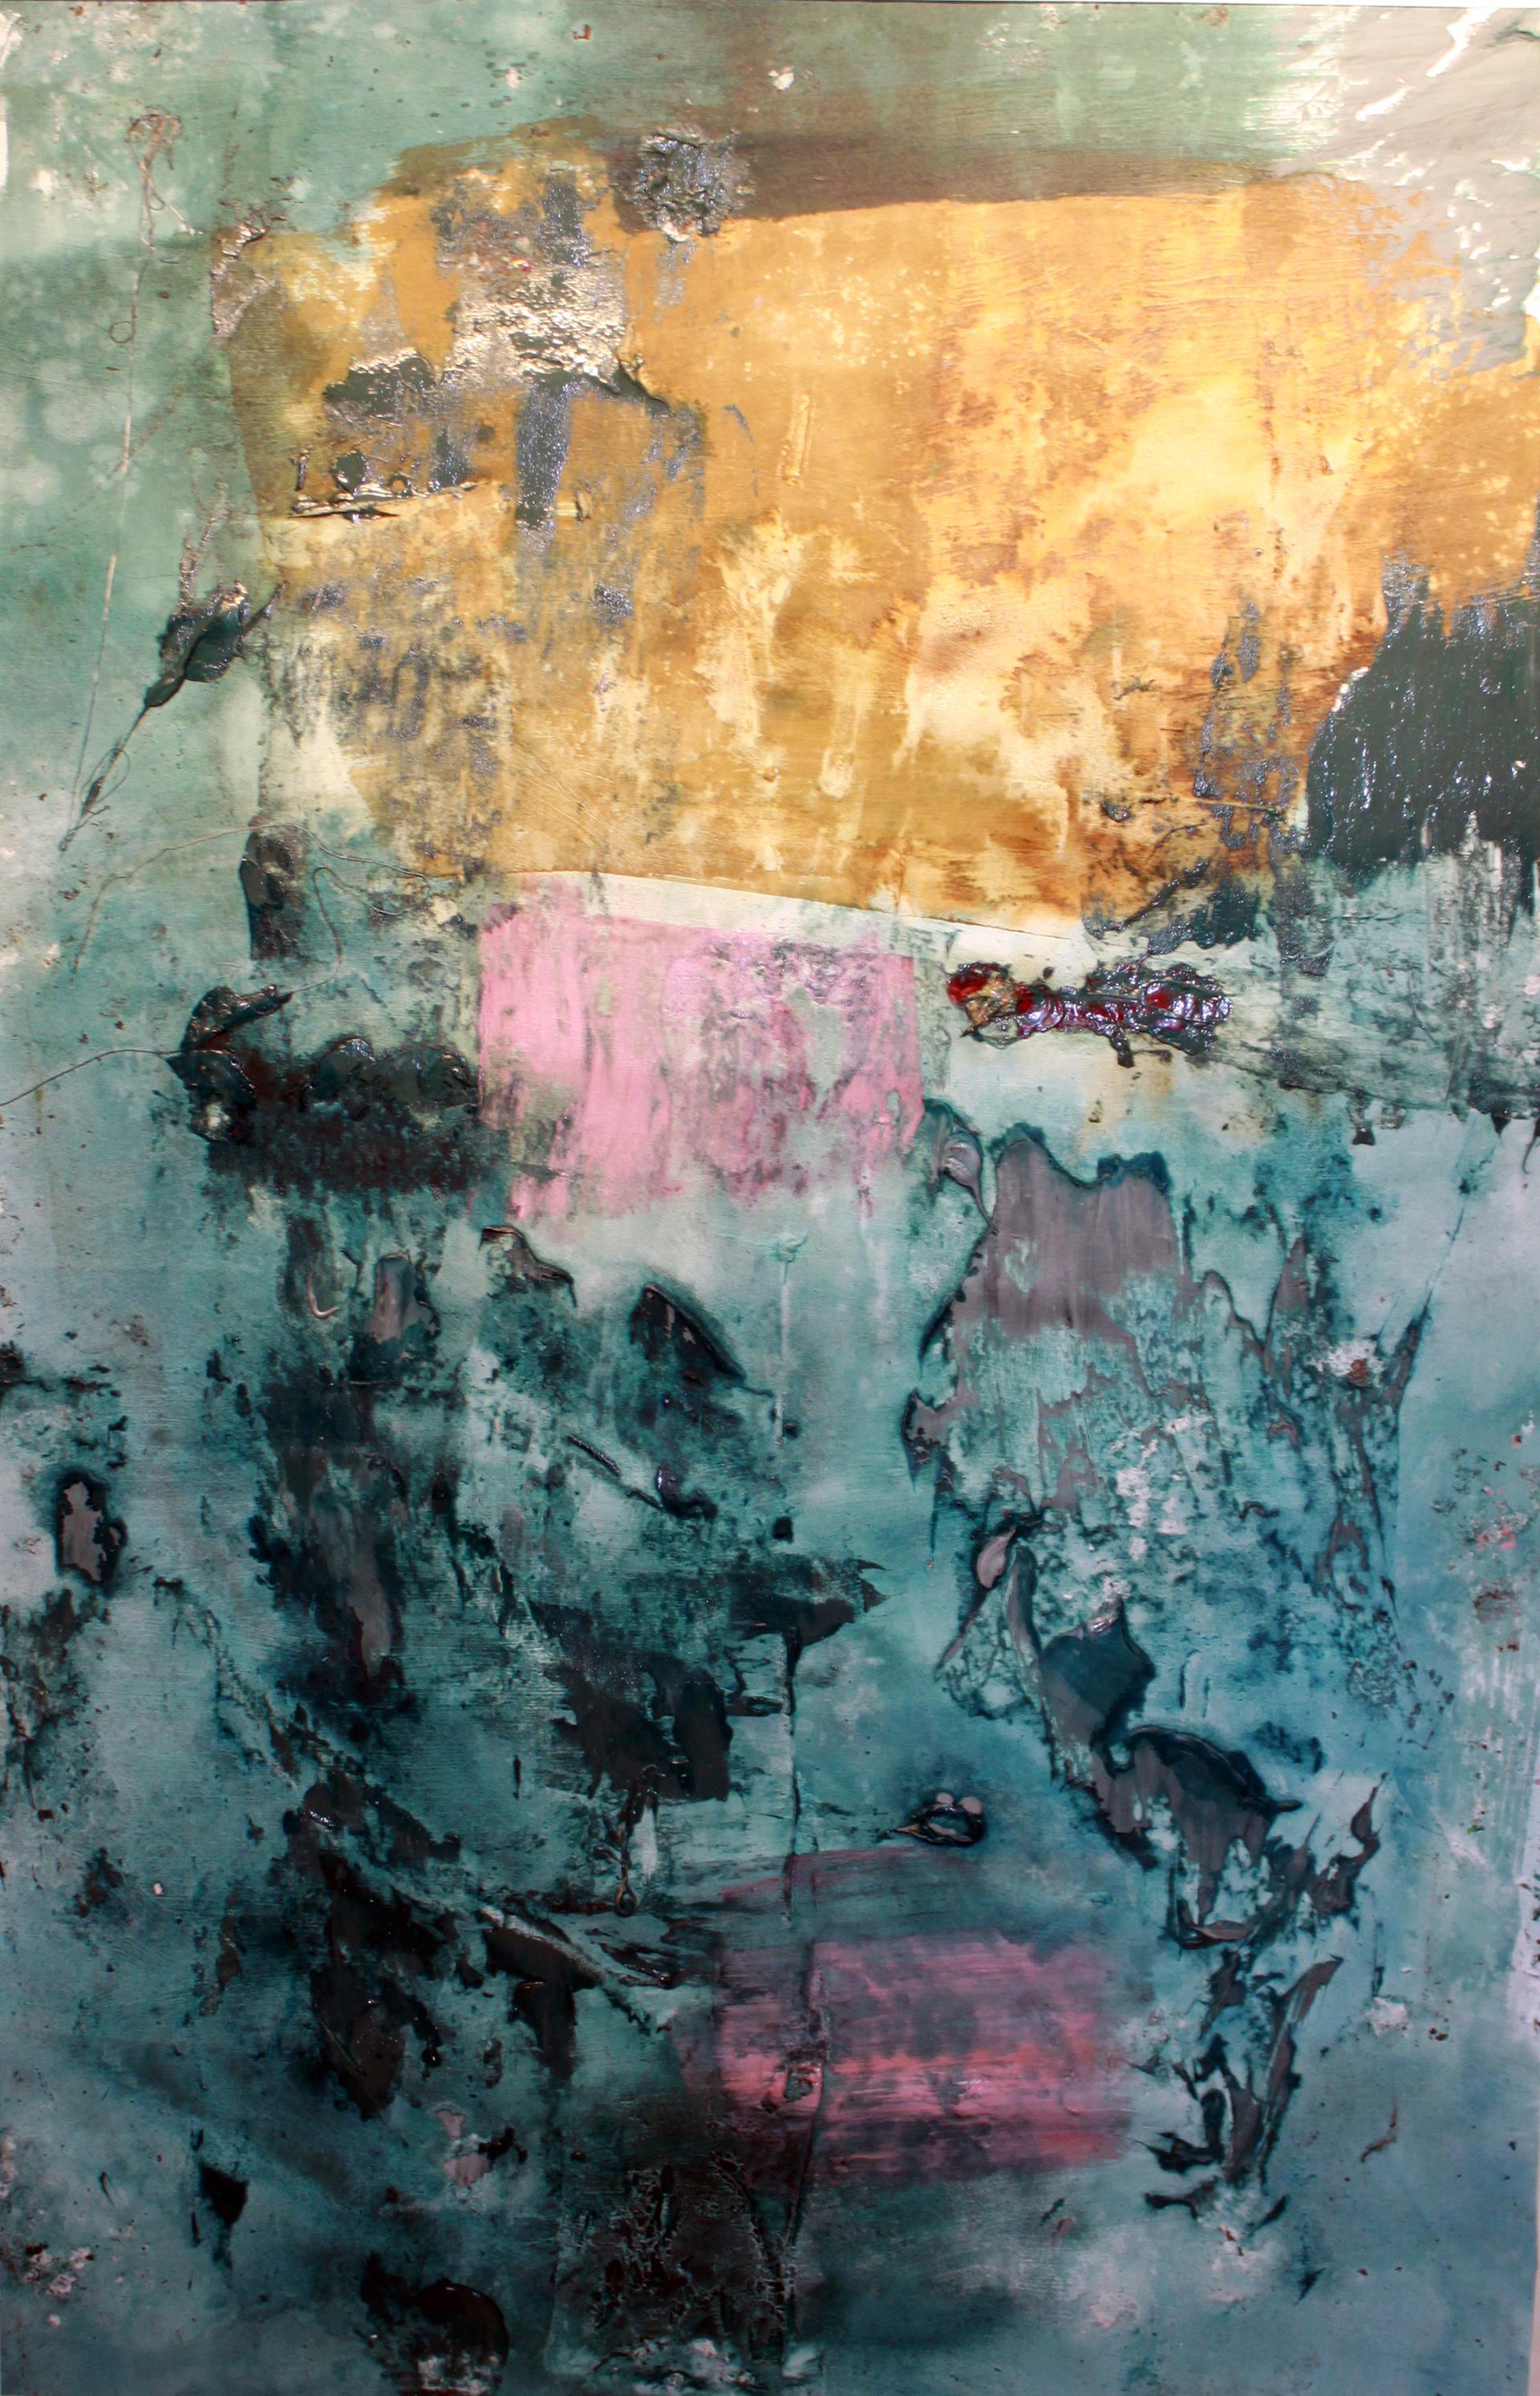 Lurk by Francine Tint